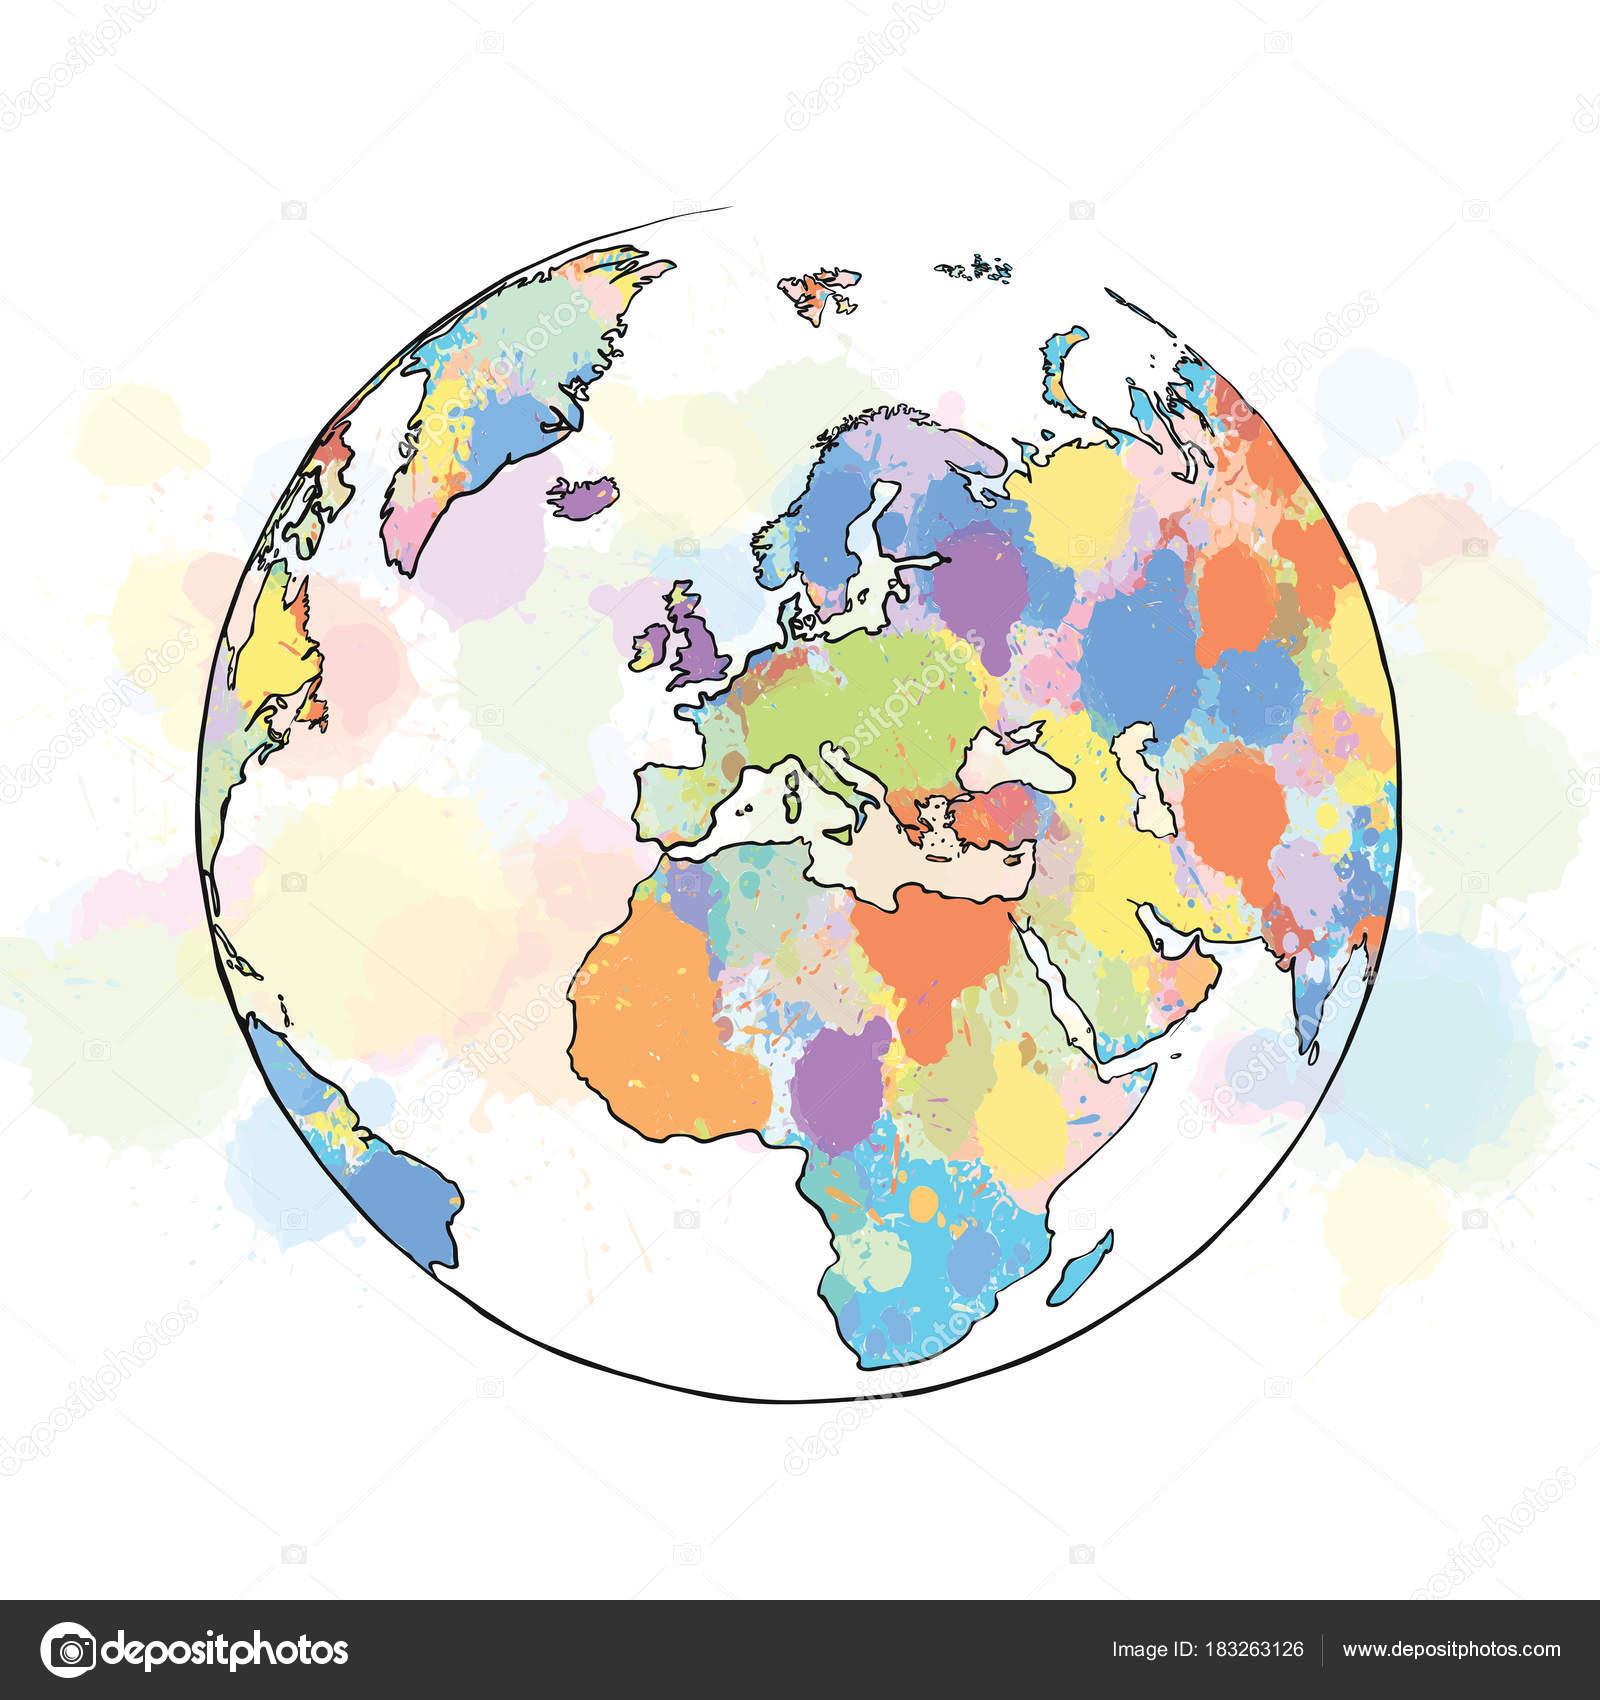 【Royalty Free】 Dünya Resmi Boyama Renkli